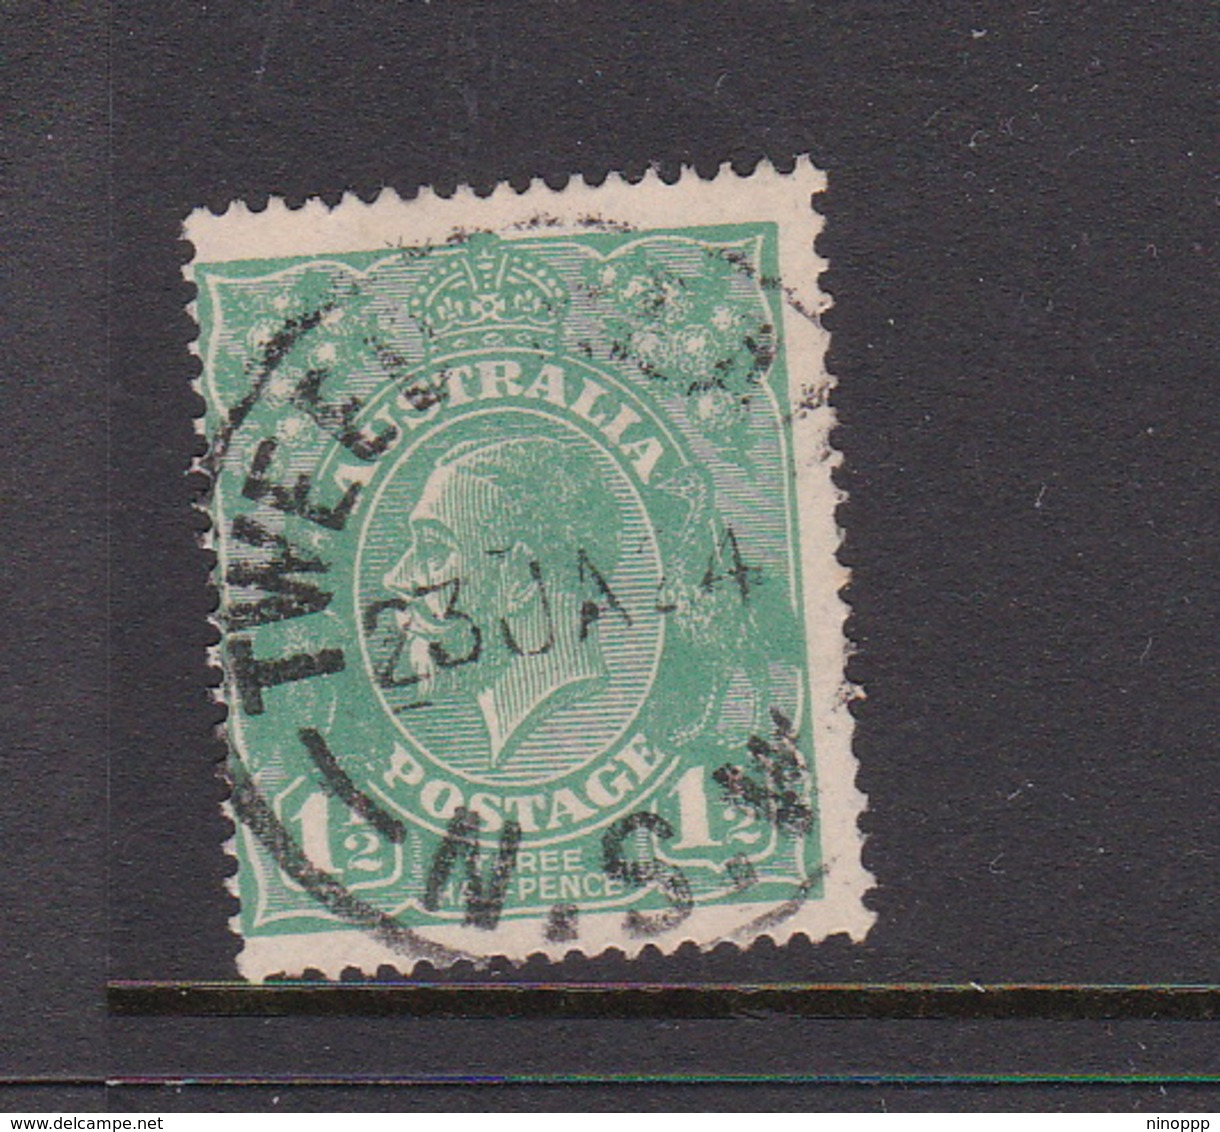 Australia SG 61 1923 King George V,Three Half Penny Green,Single Watermark, Used - 1913-36 George V: Heads